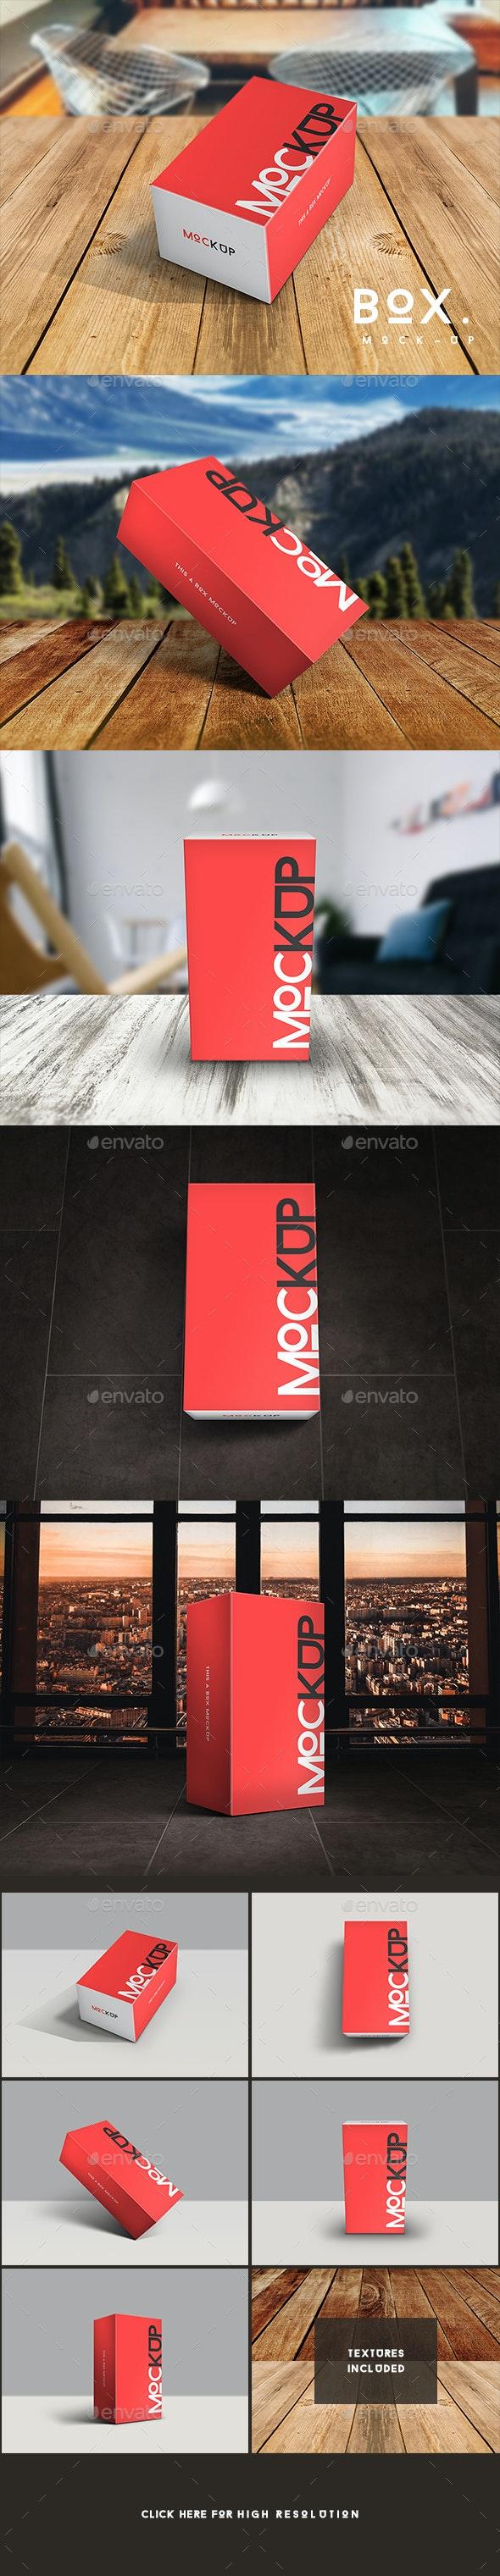 Mobile Box Mockup - Packaging Product Mock-Ups